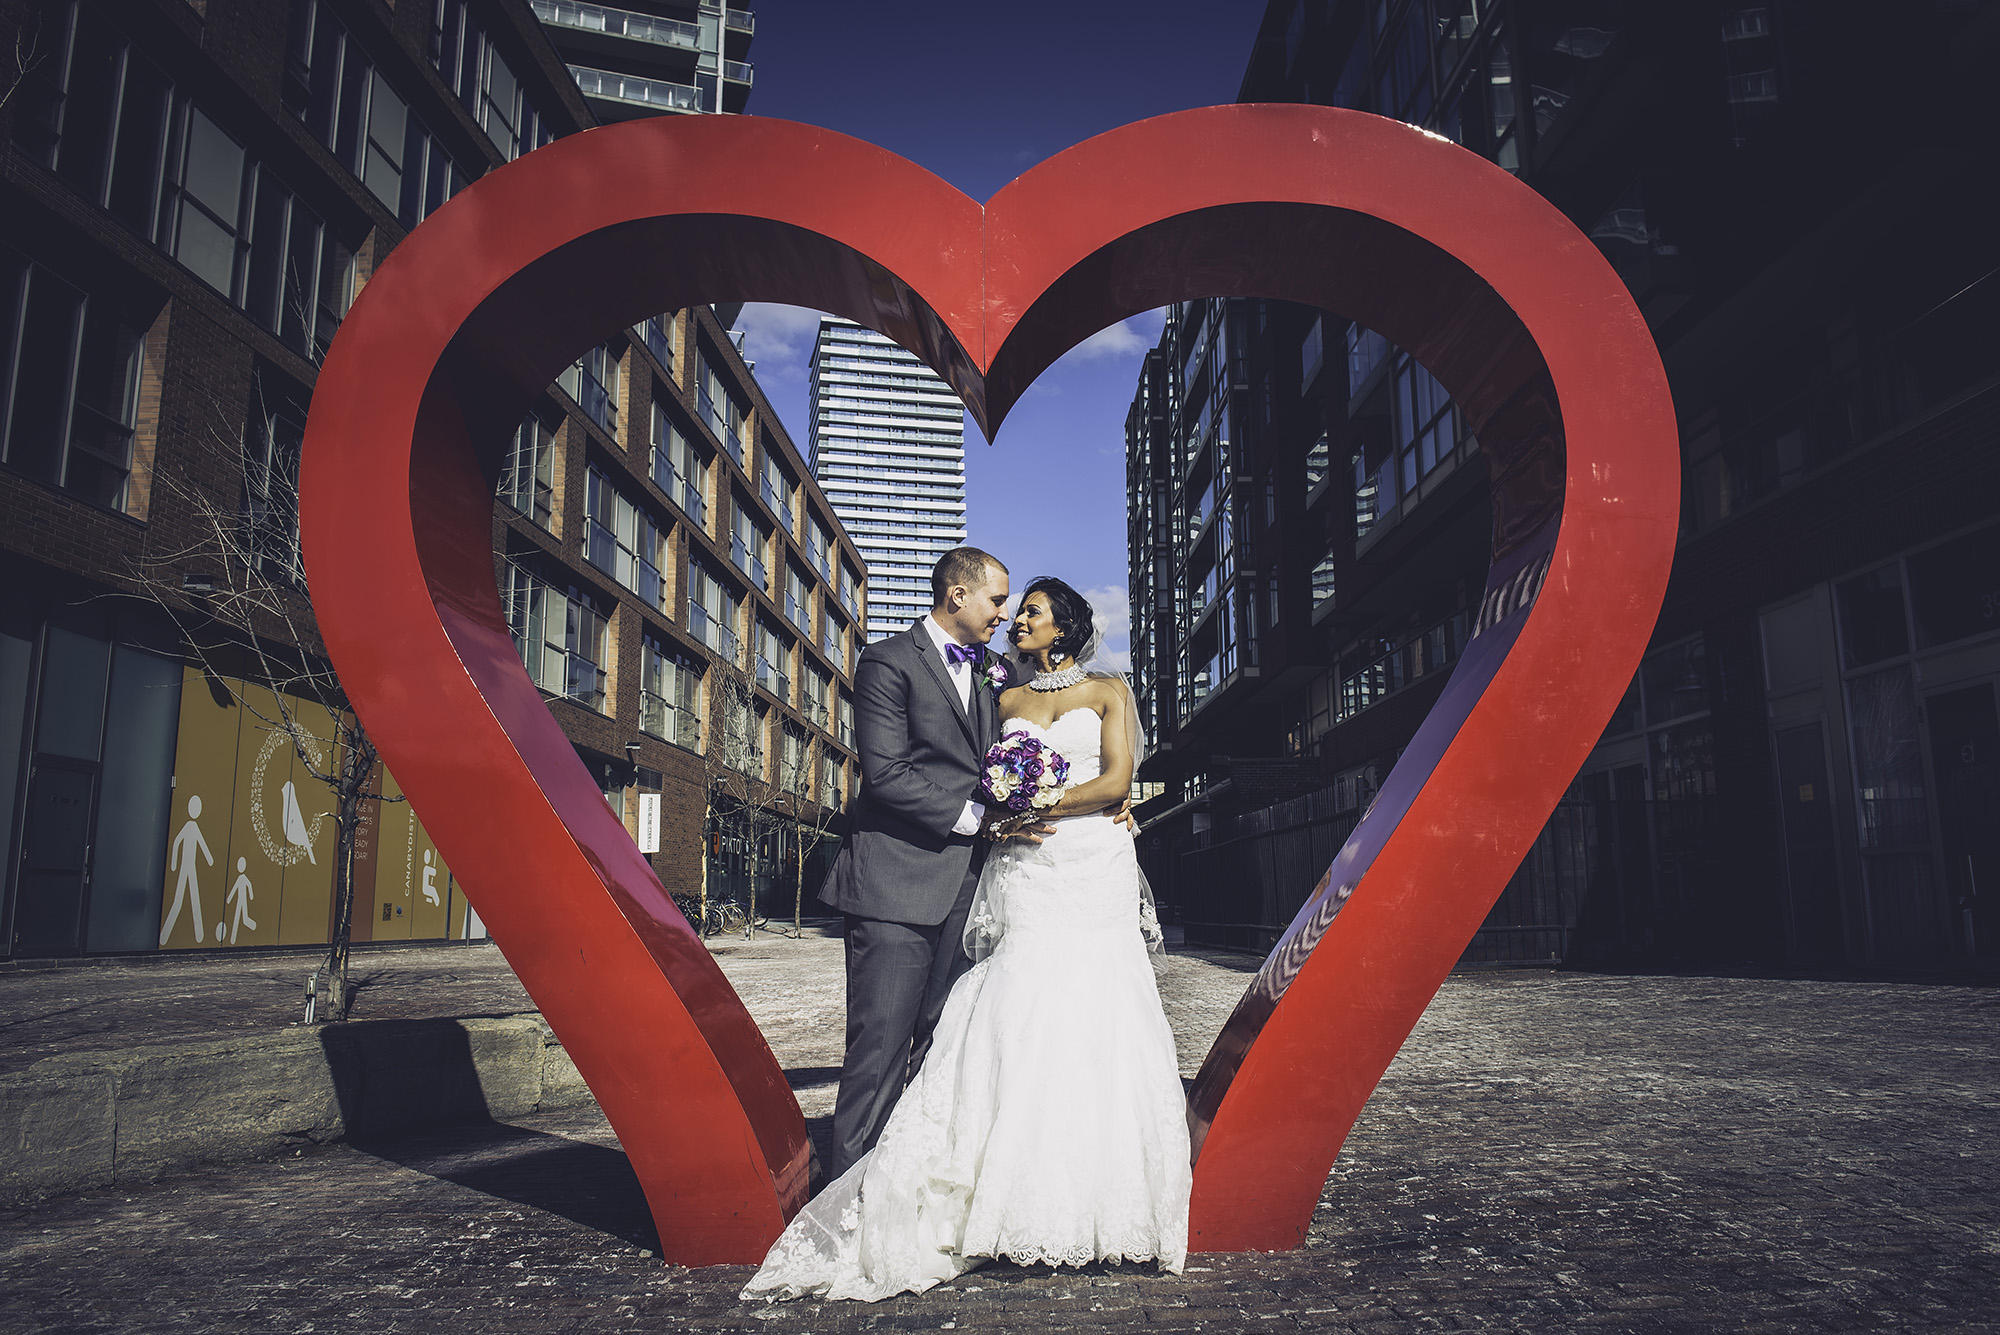 Toronto_Wedding_Photography_Alicia_Campbell_5.jpg